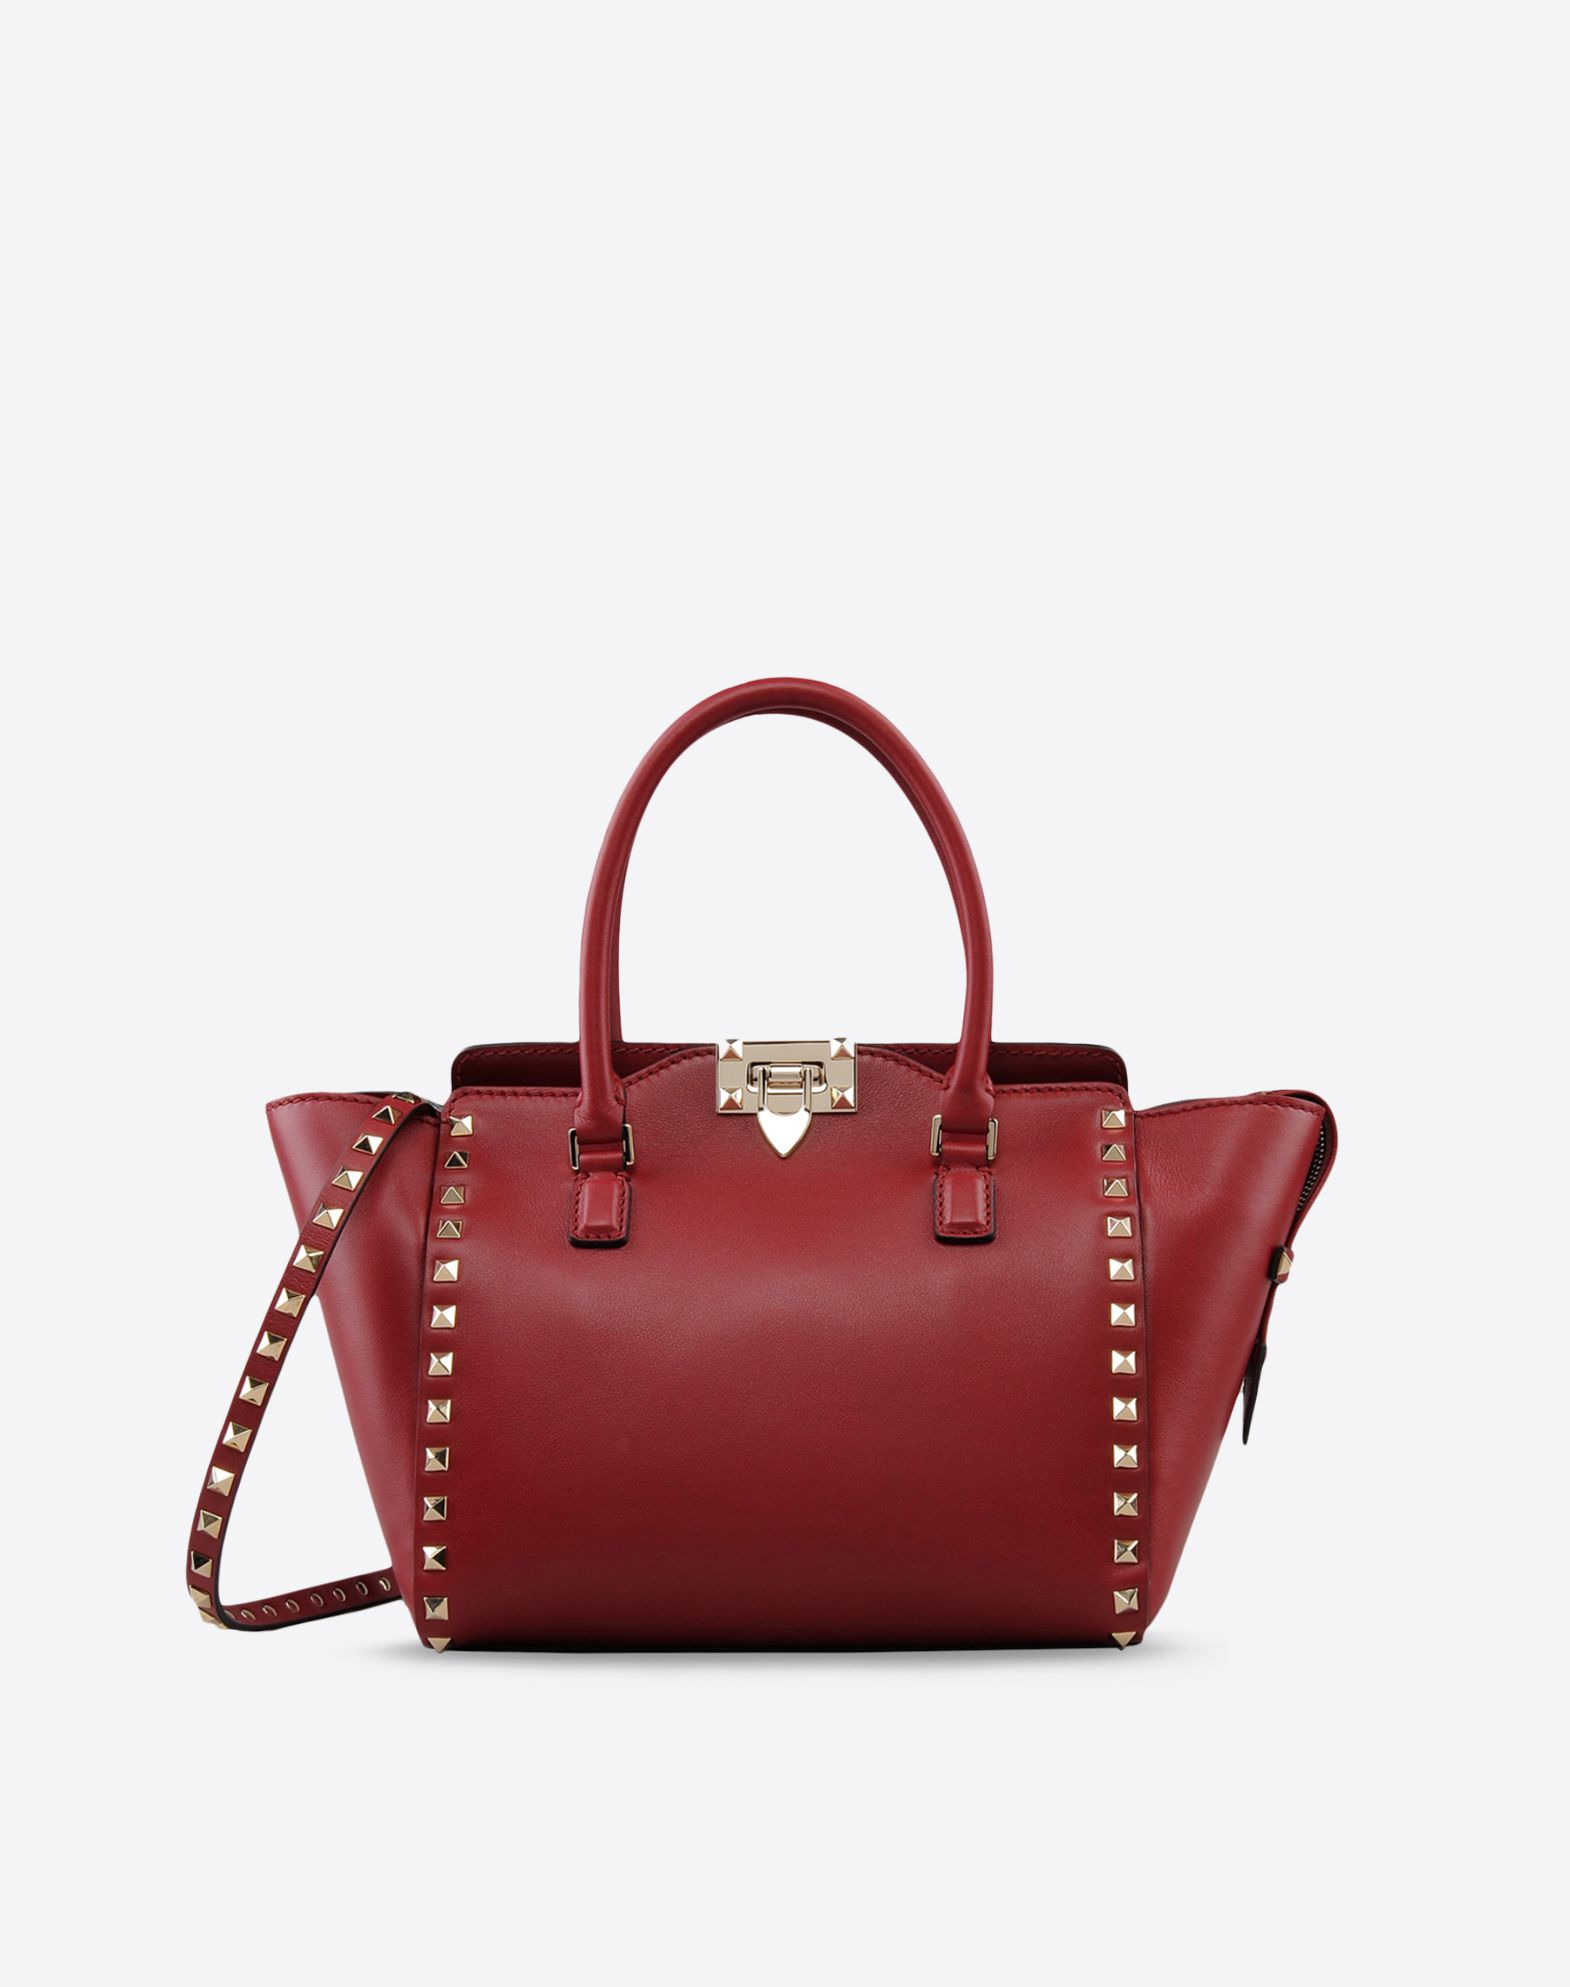 dc019d19628e Valentino Garavani Fake Handbags